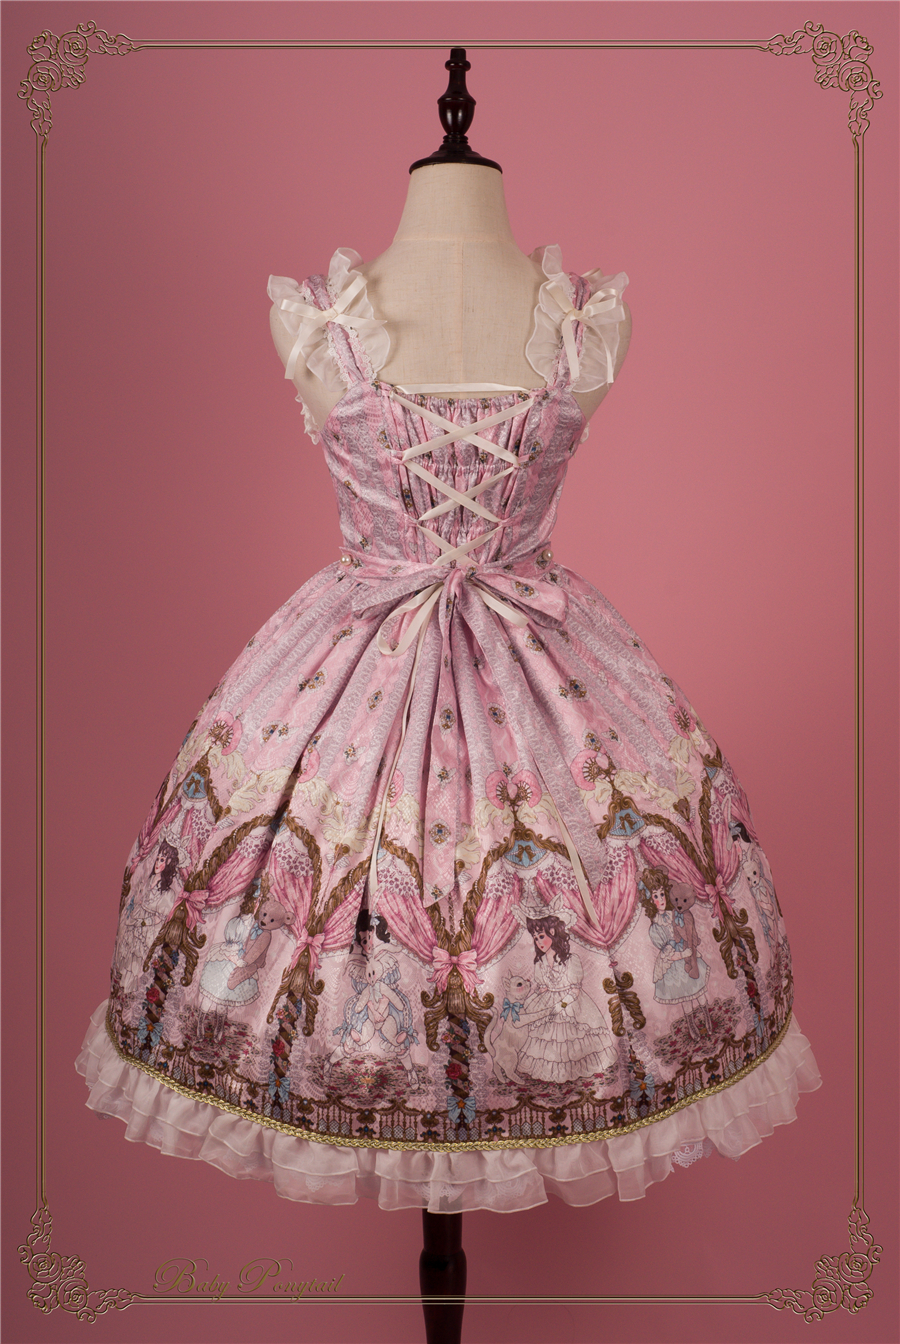 BabyPonytail_Stock Photo_My Favorite Companion_JSK Pink_6.jpg